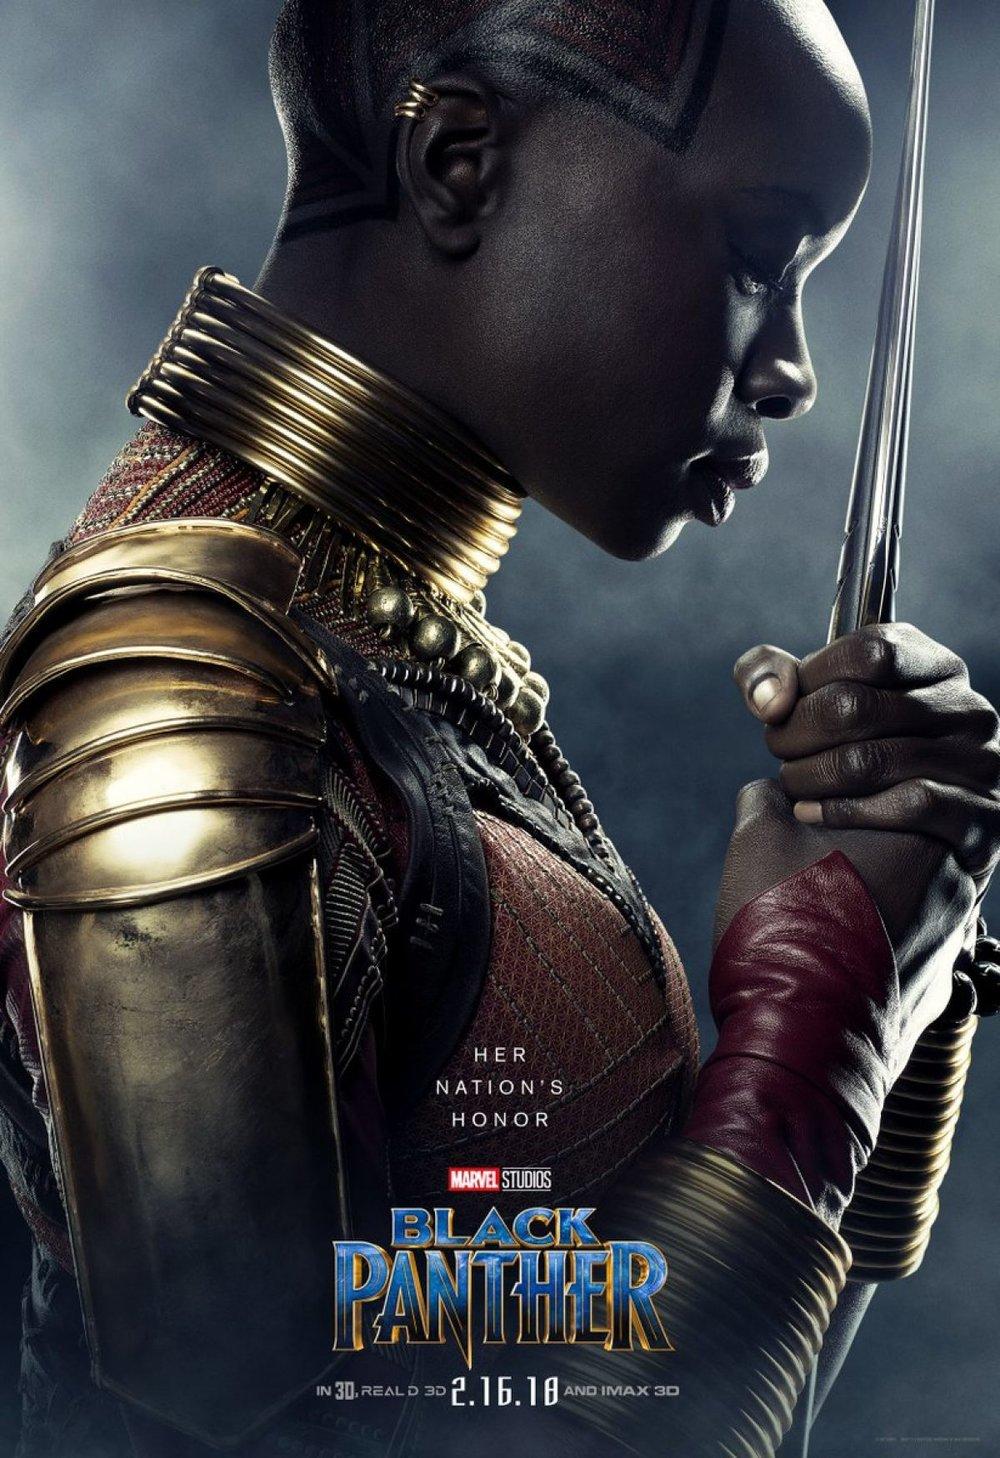 Black-Panther-Poster-2_1200_1750_81_s.jpeg